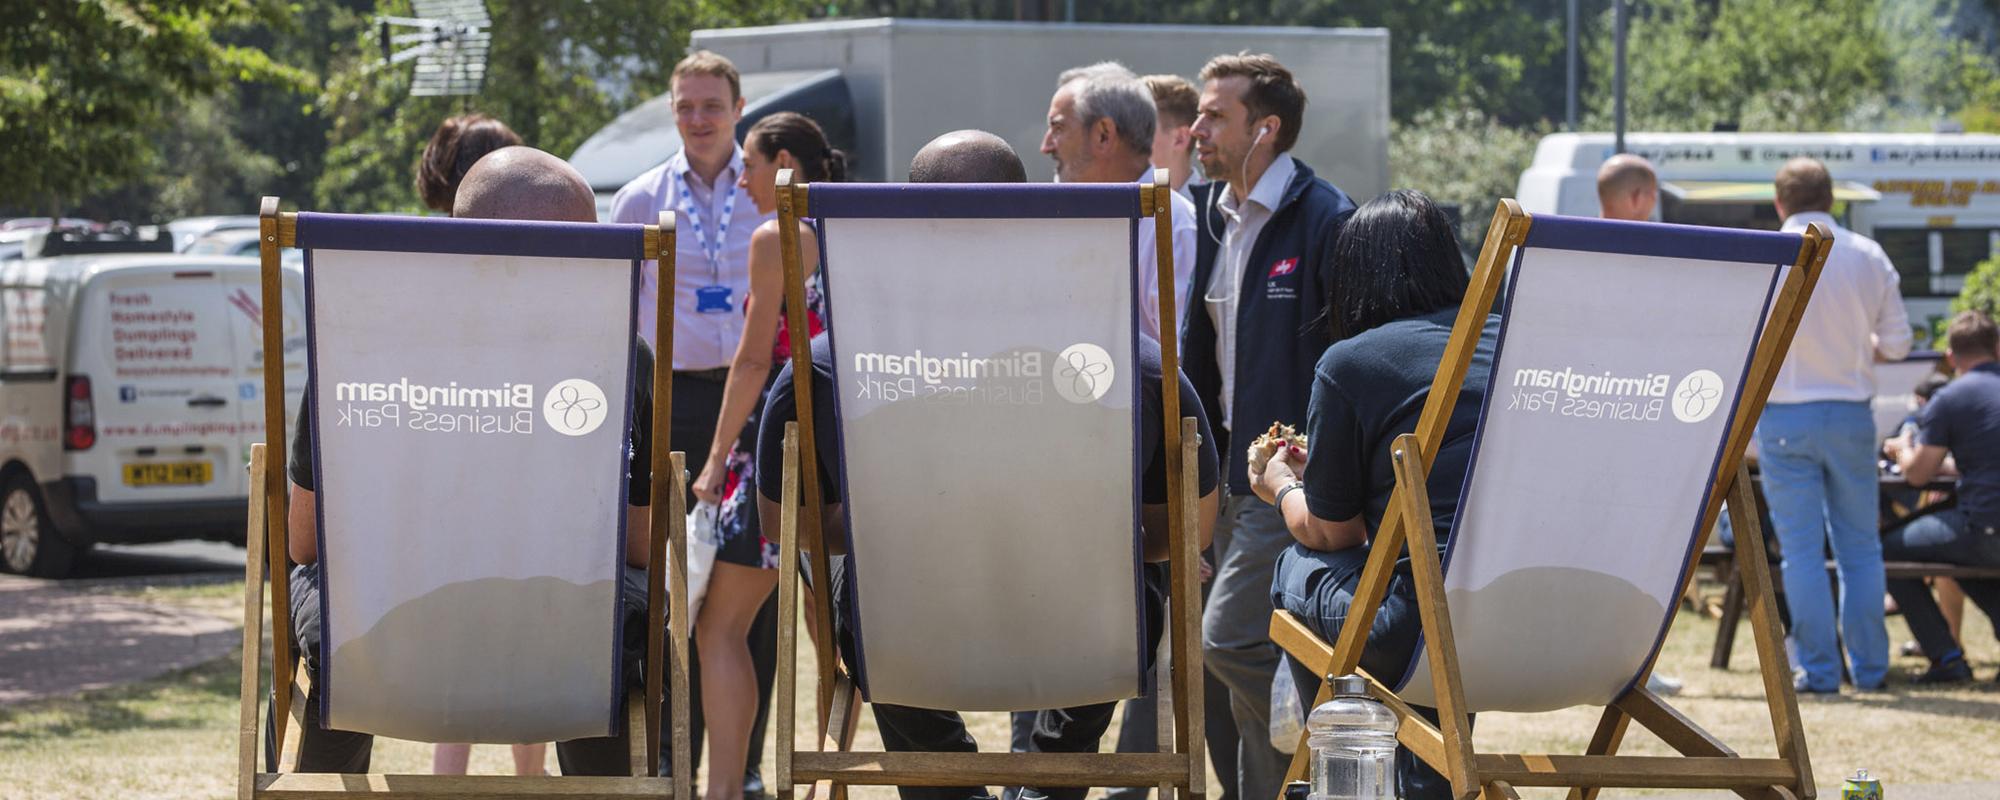 Placemaking success at Birmingham Business Park